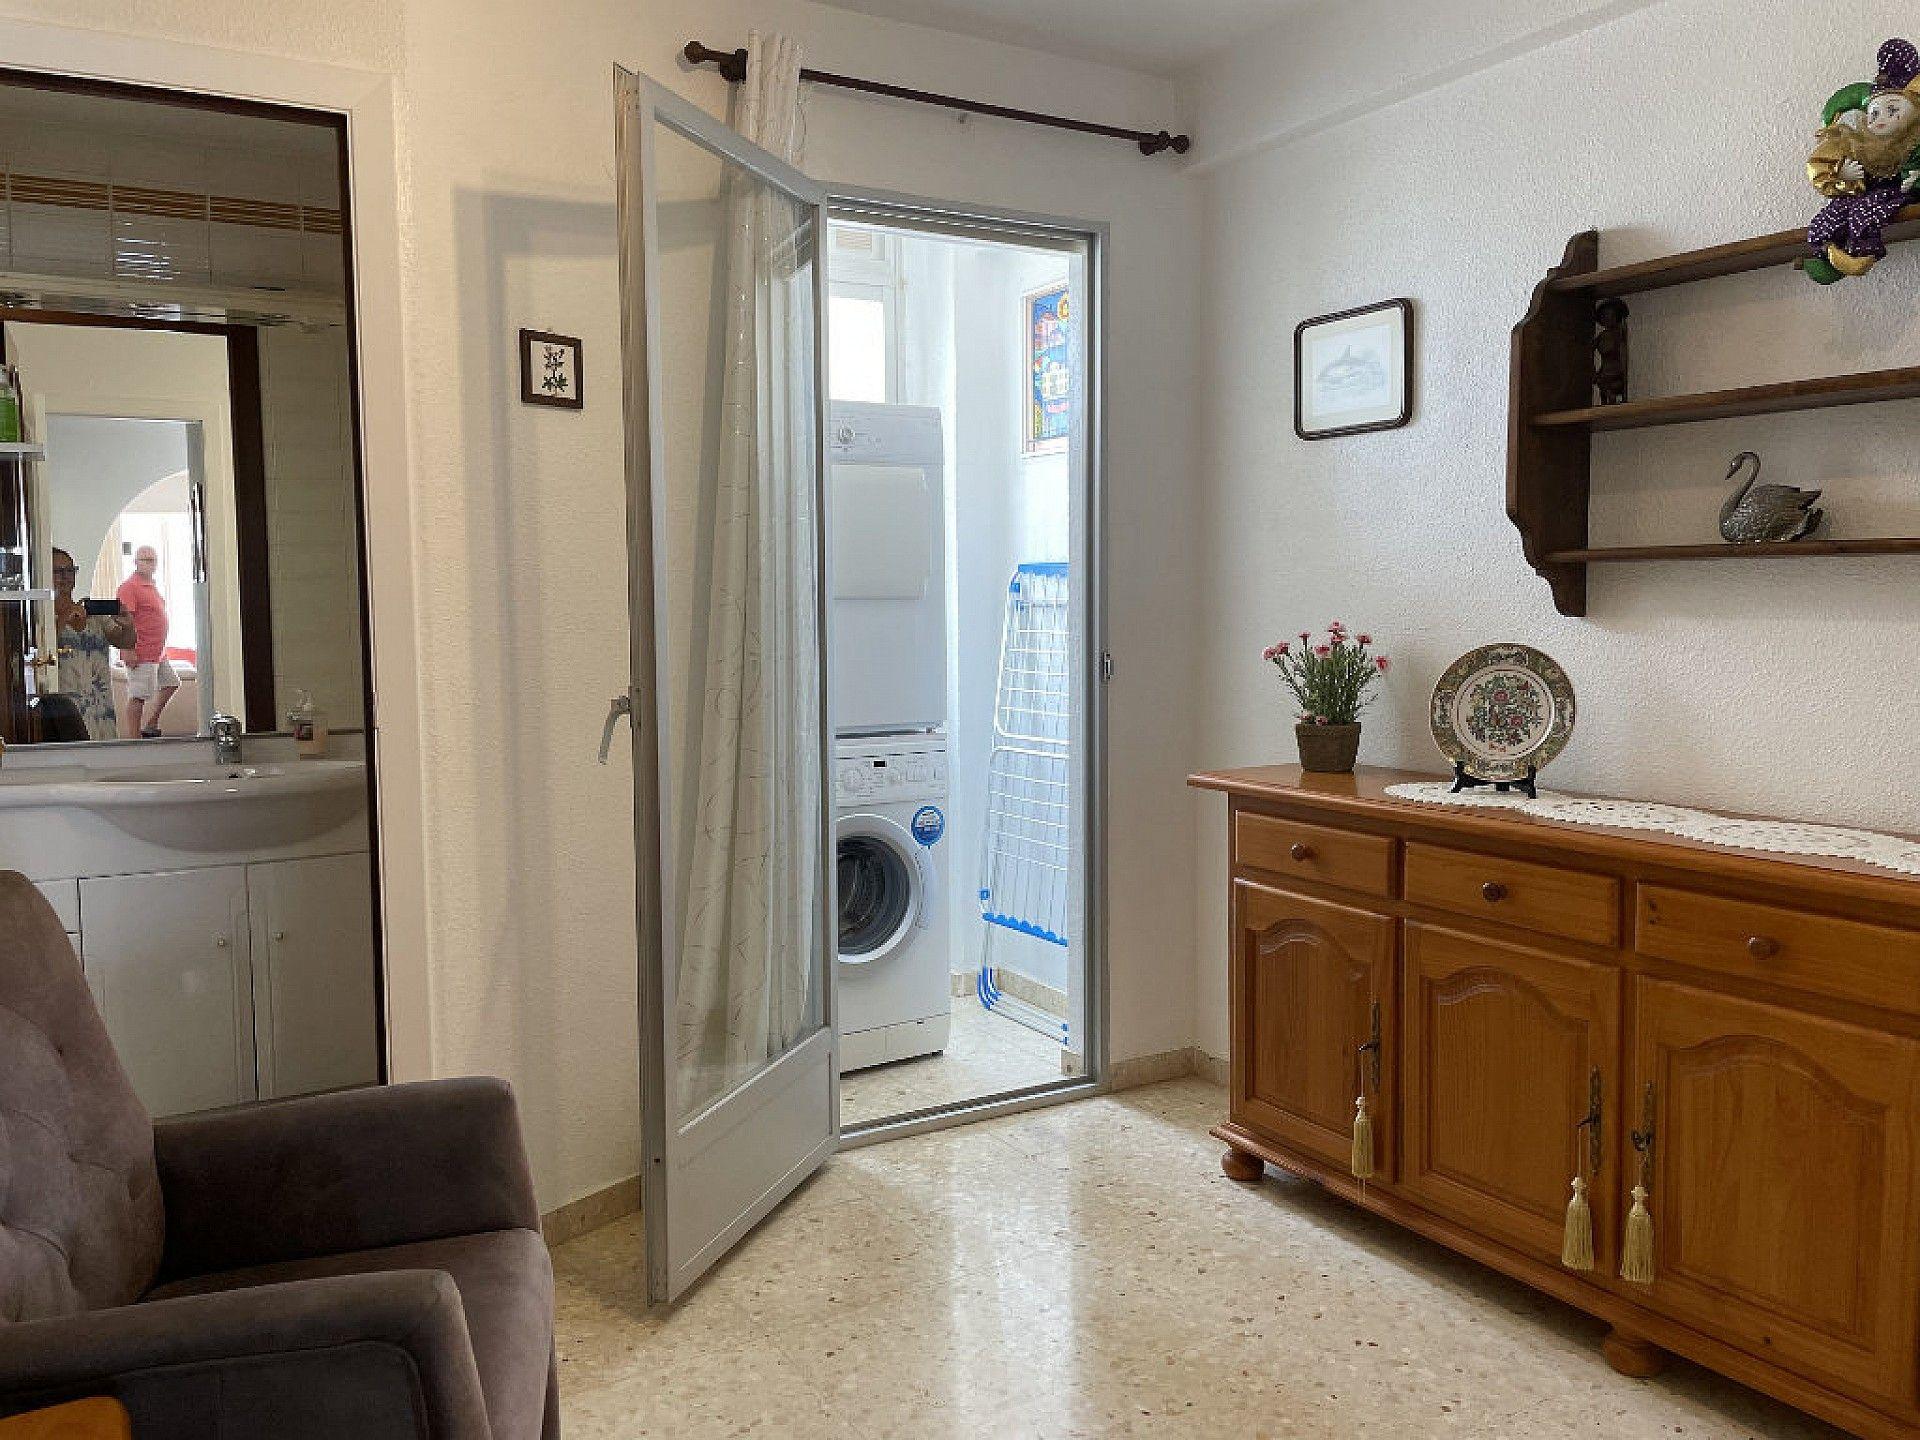 w_appartement-tekoop-costa-blanca-calpe-a1068-spanje12.jpg